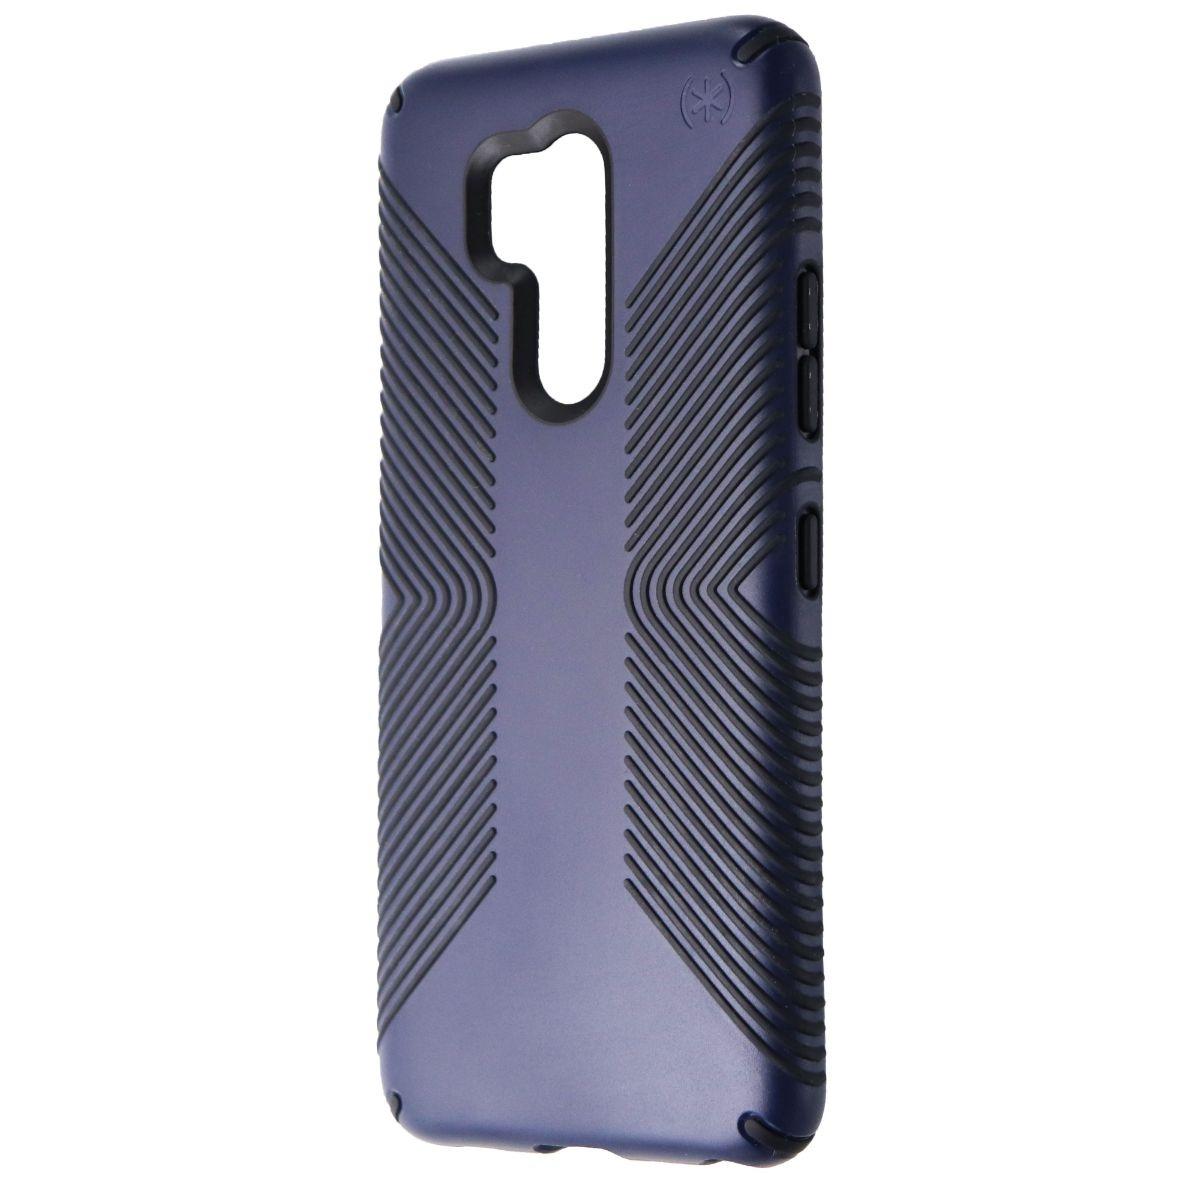 Speck Presidio Grip Phone Case for LG G7 ThinQ - Eclipse Blue / Carbon Black